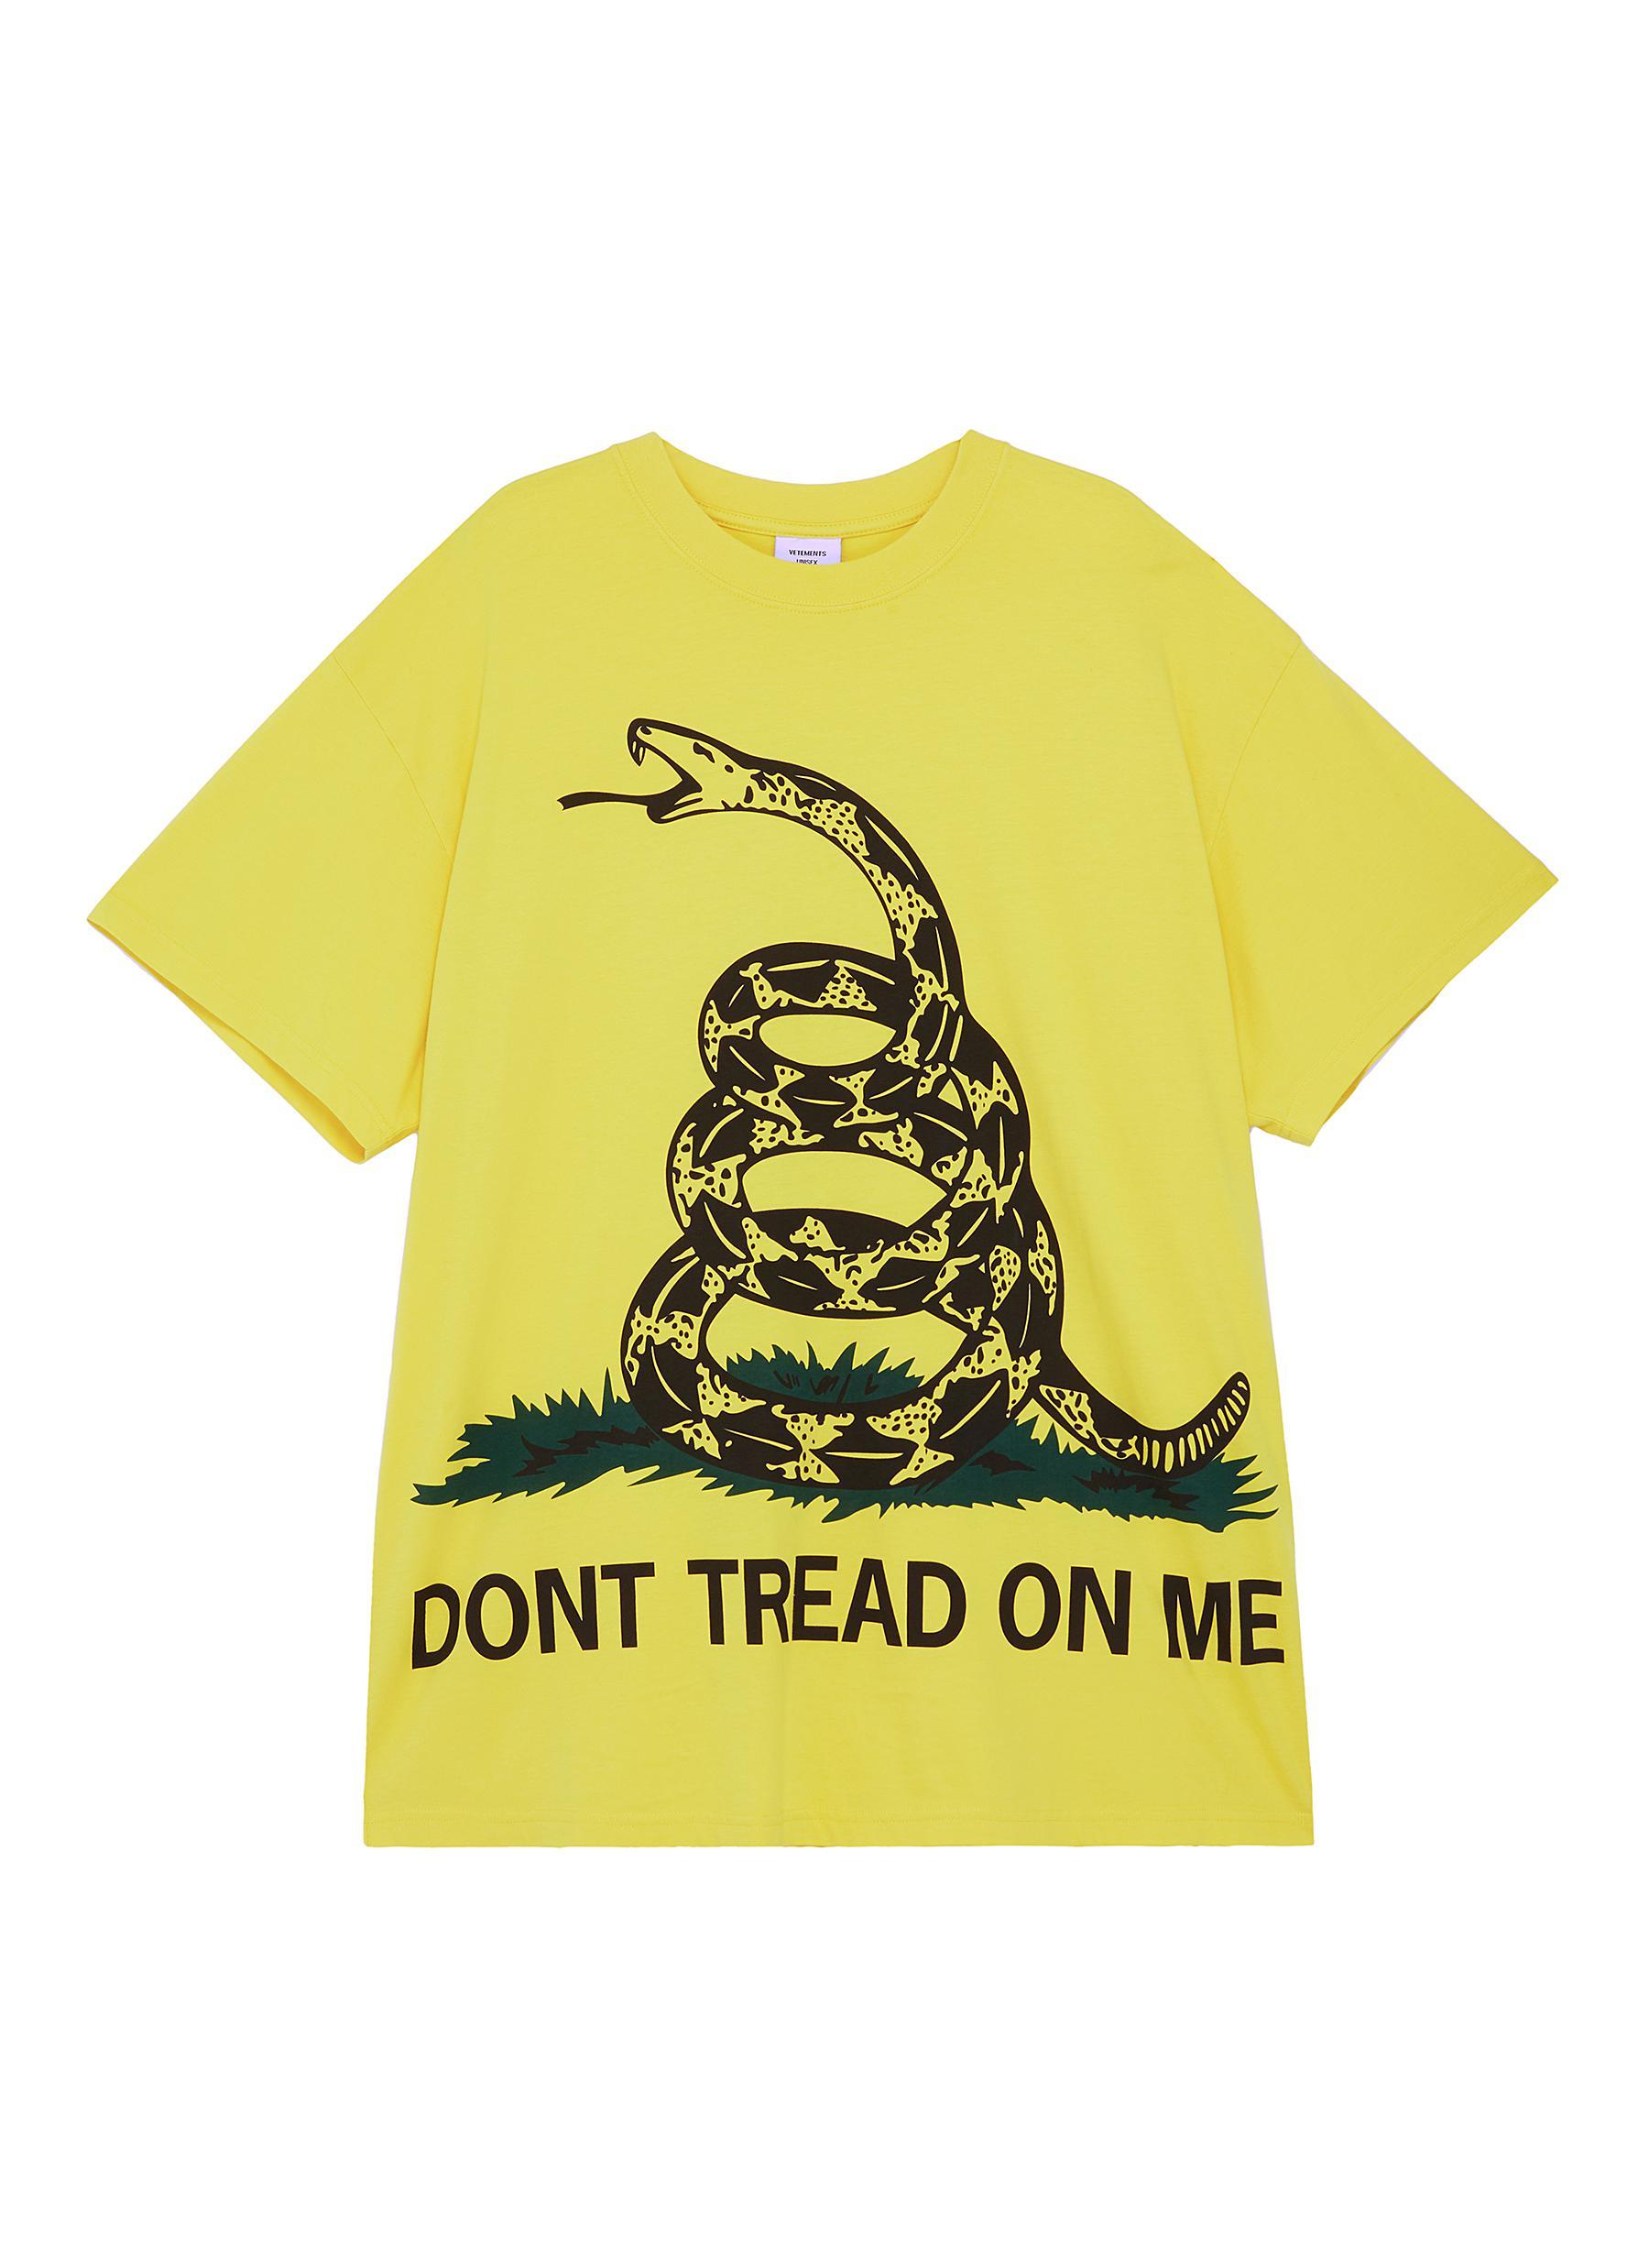 324cb856 Main View - Click To Enlarge - Vetements - Snake slogan print unisex T-shirt